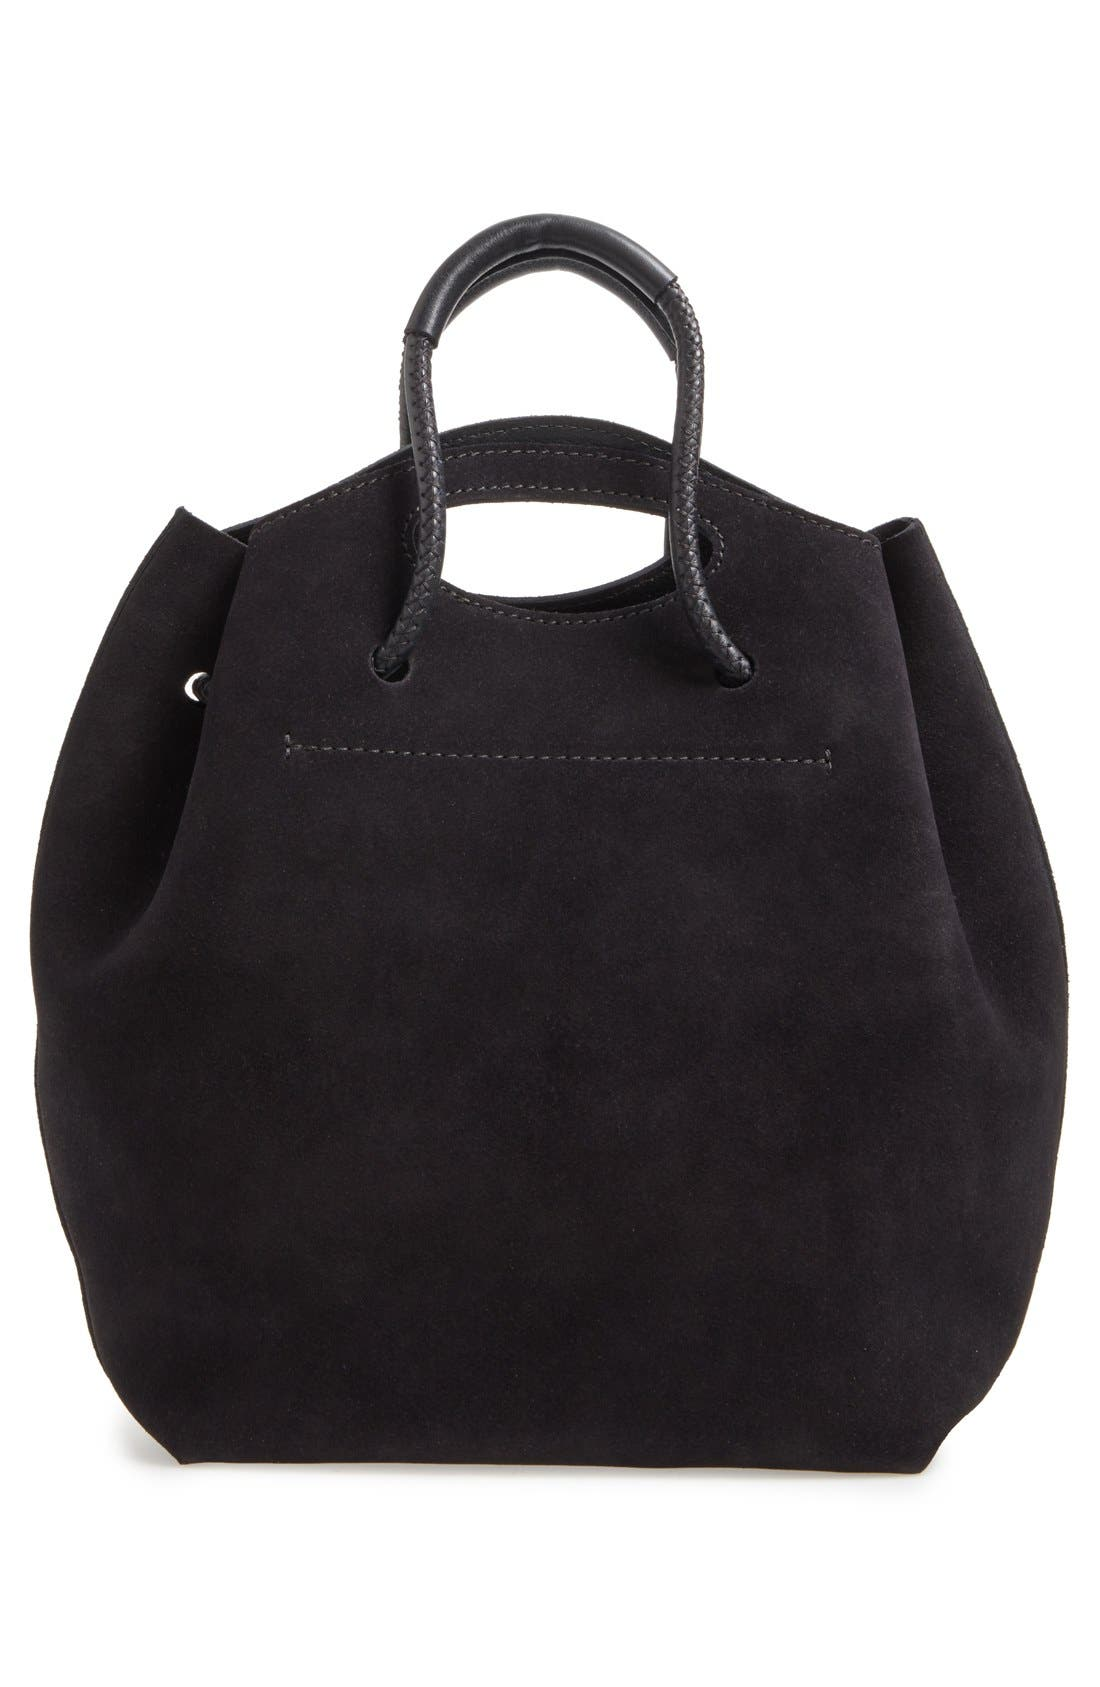 PEDRO GARCIA, Suede Drawstring Bucket Bag, Alternate thumbnail 3, color, 002